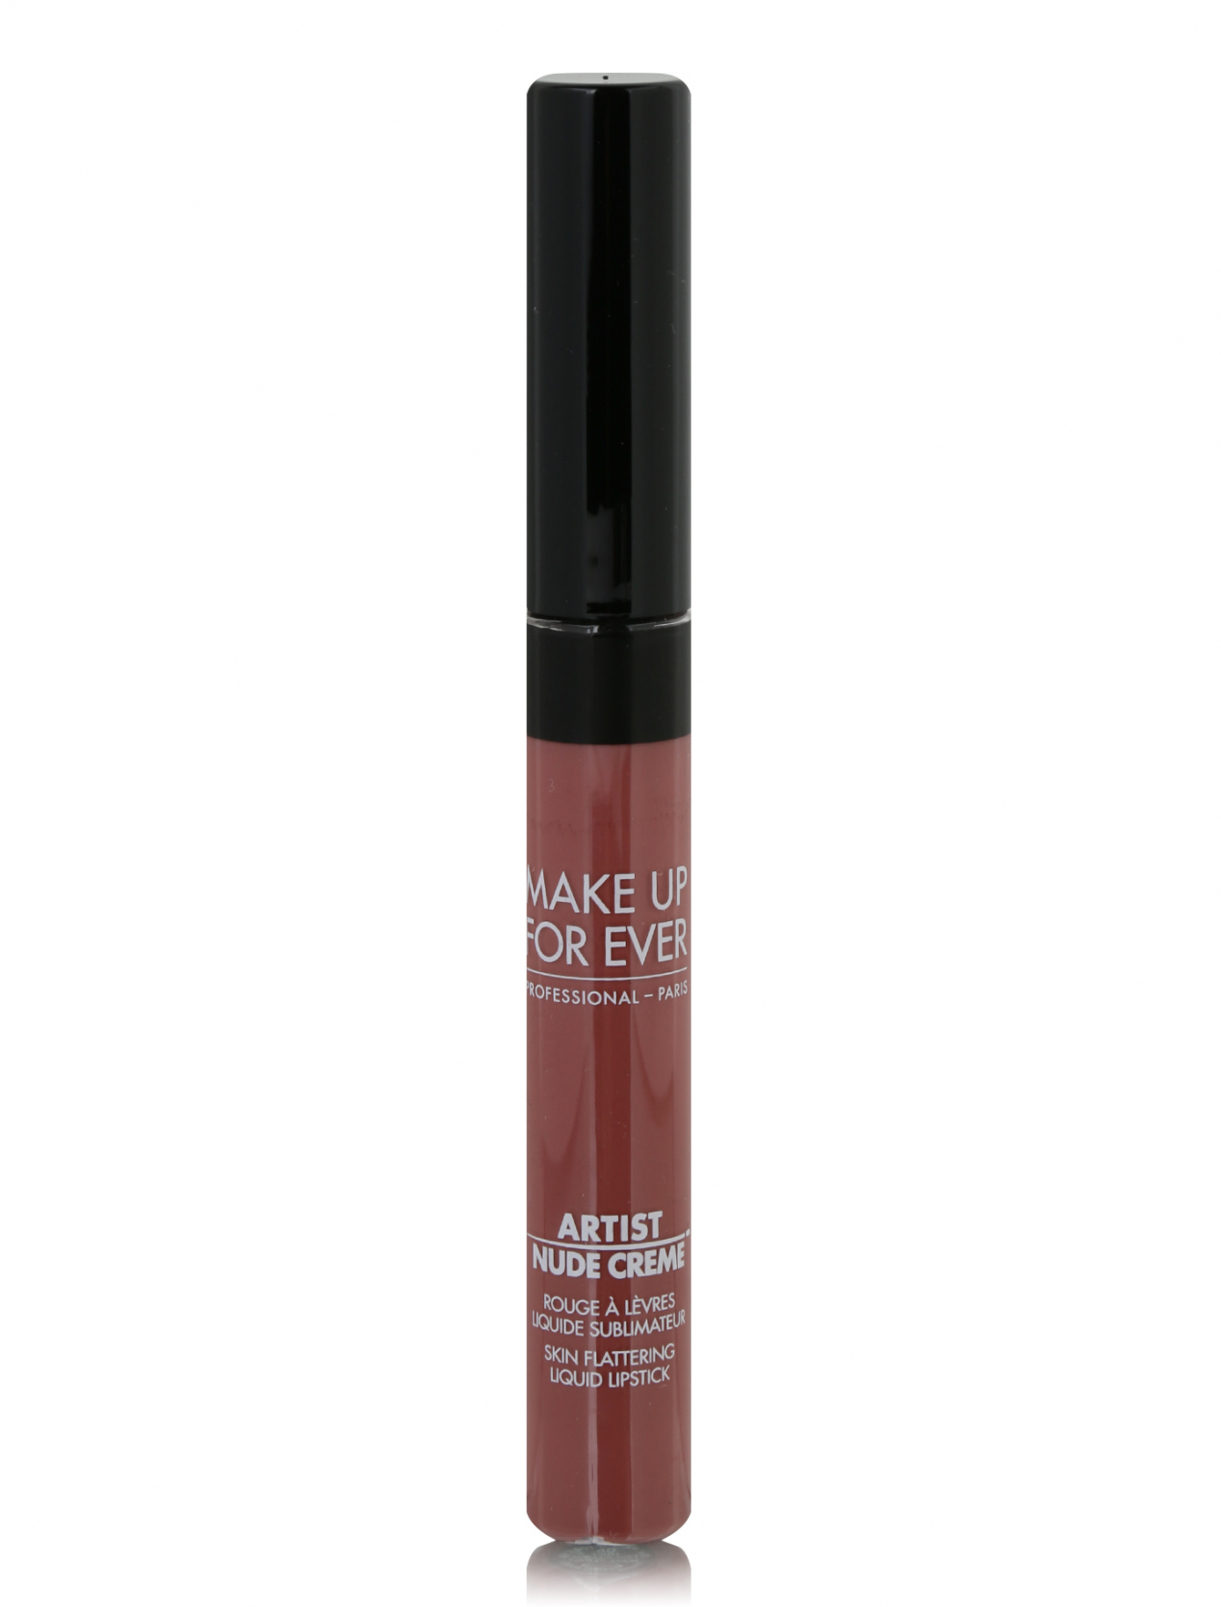 Make Up For Ever Artist Nude Creme Skin Flattering Liquid